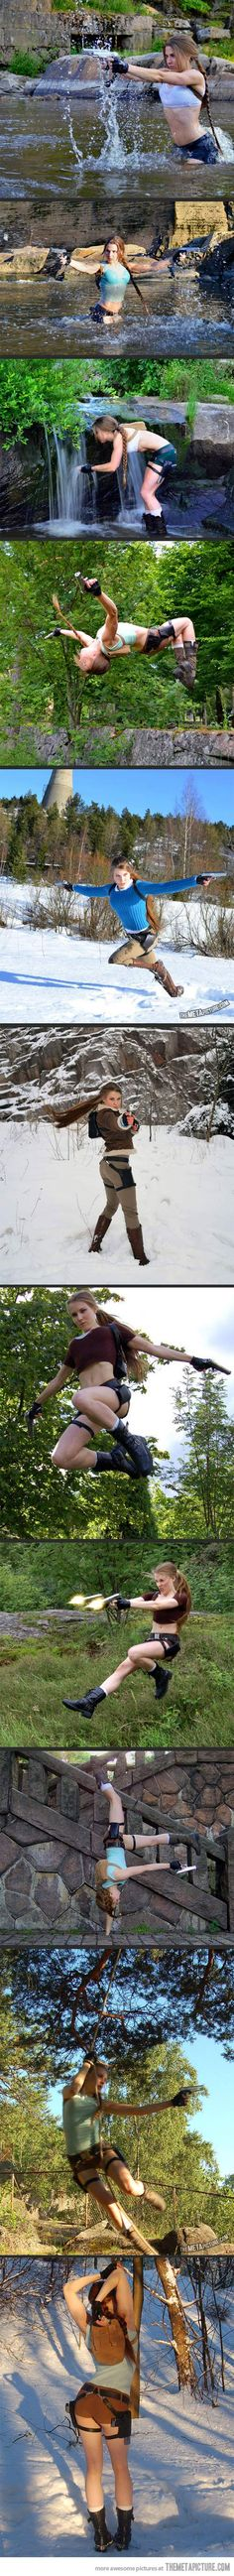 Character: Lara Croft / From: Eidos Interactive & Square Enix's 'Tomb Raider' Video Game Series / Cosplayer: Sari Ruoskanen